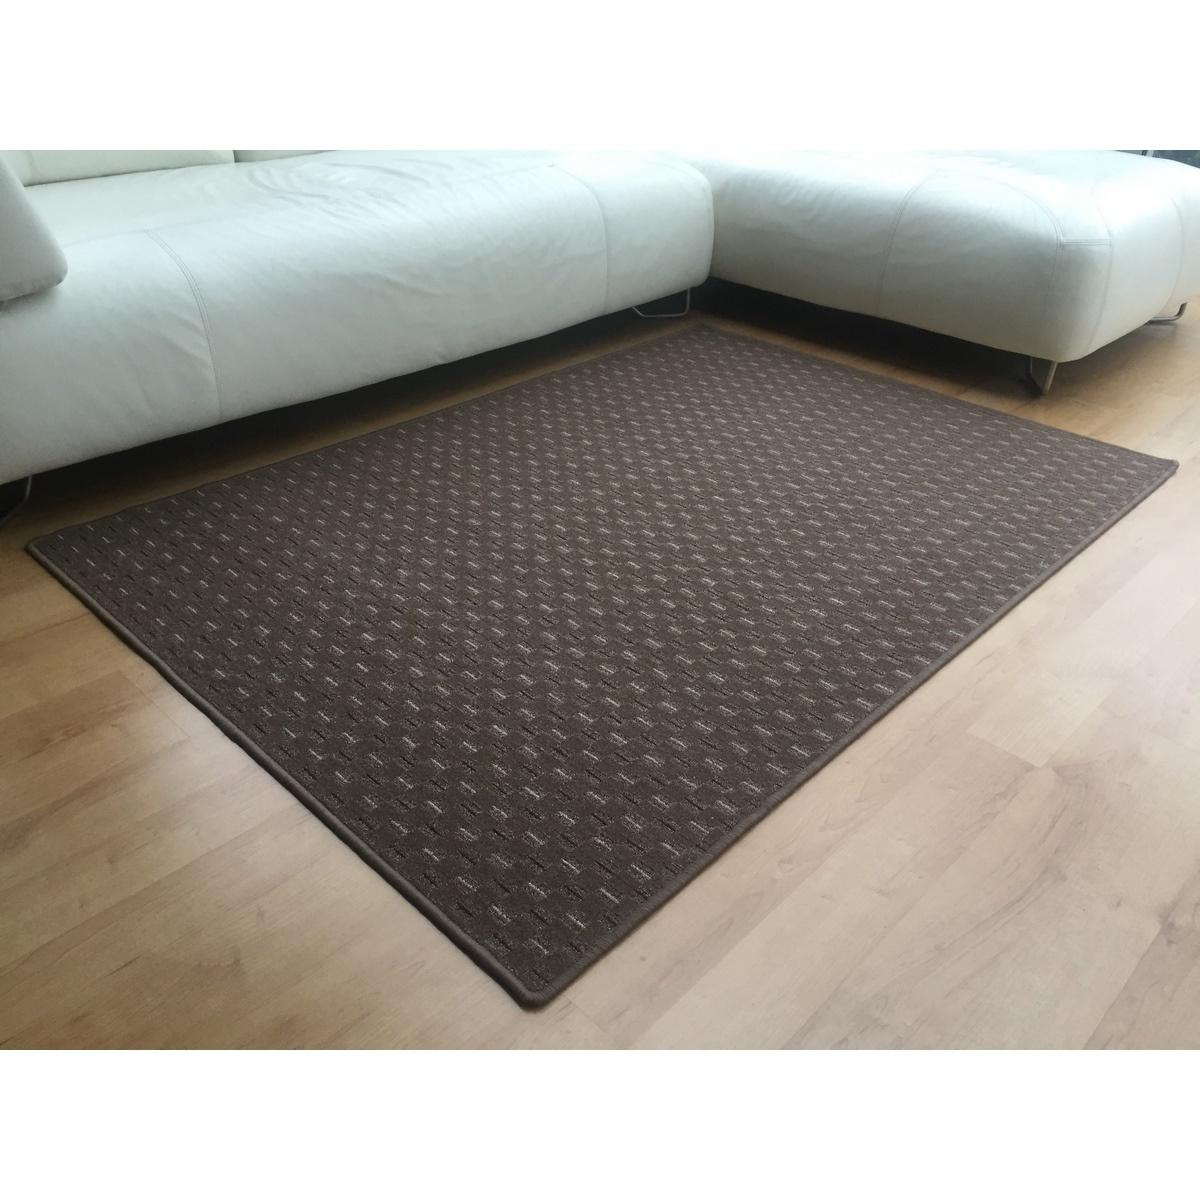 Vopi Kusový koberec Valencia hnedá, 140 x 200 cm